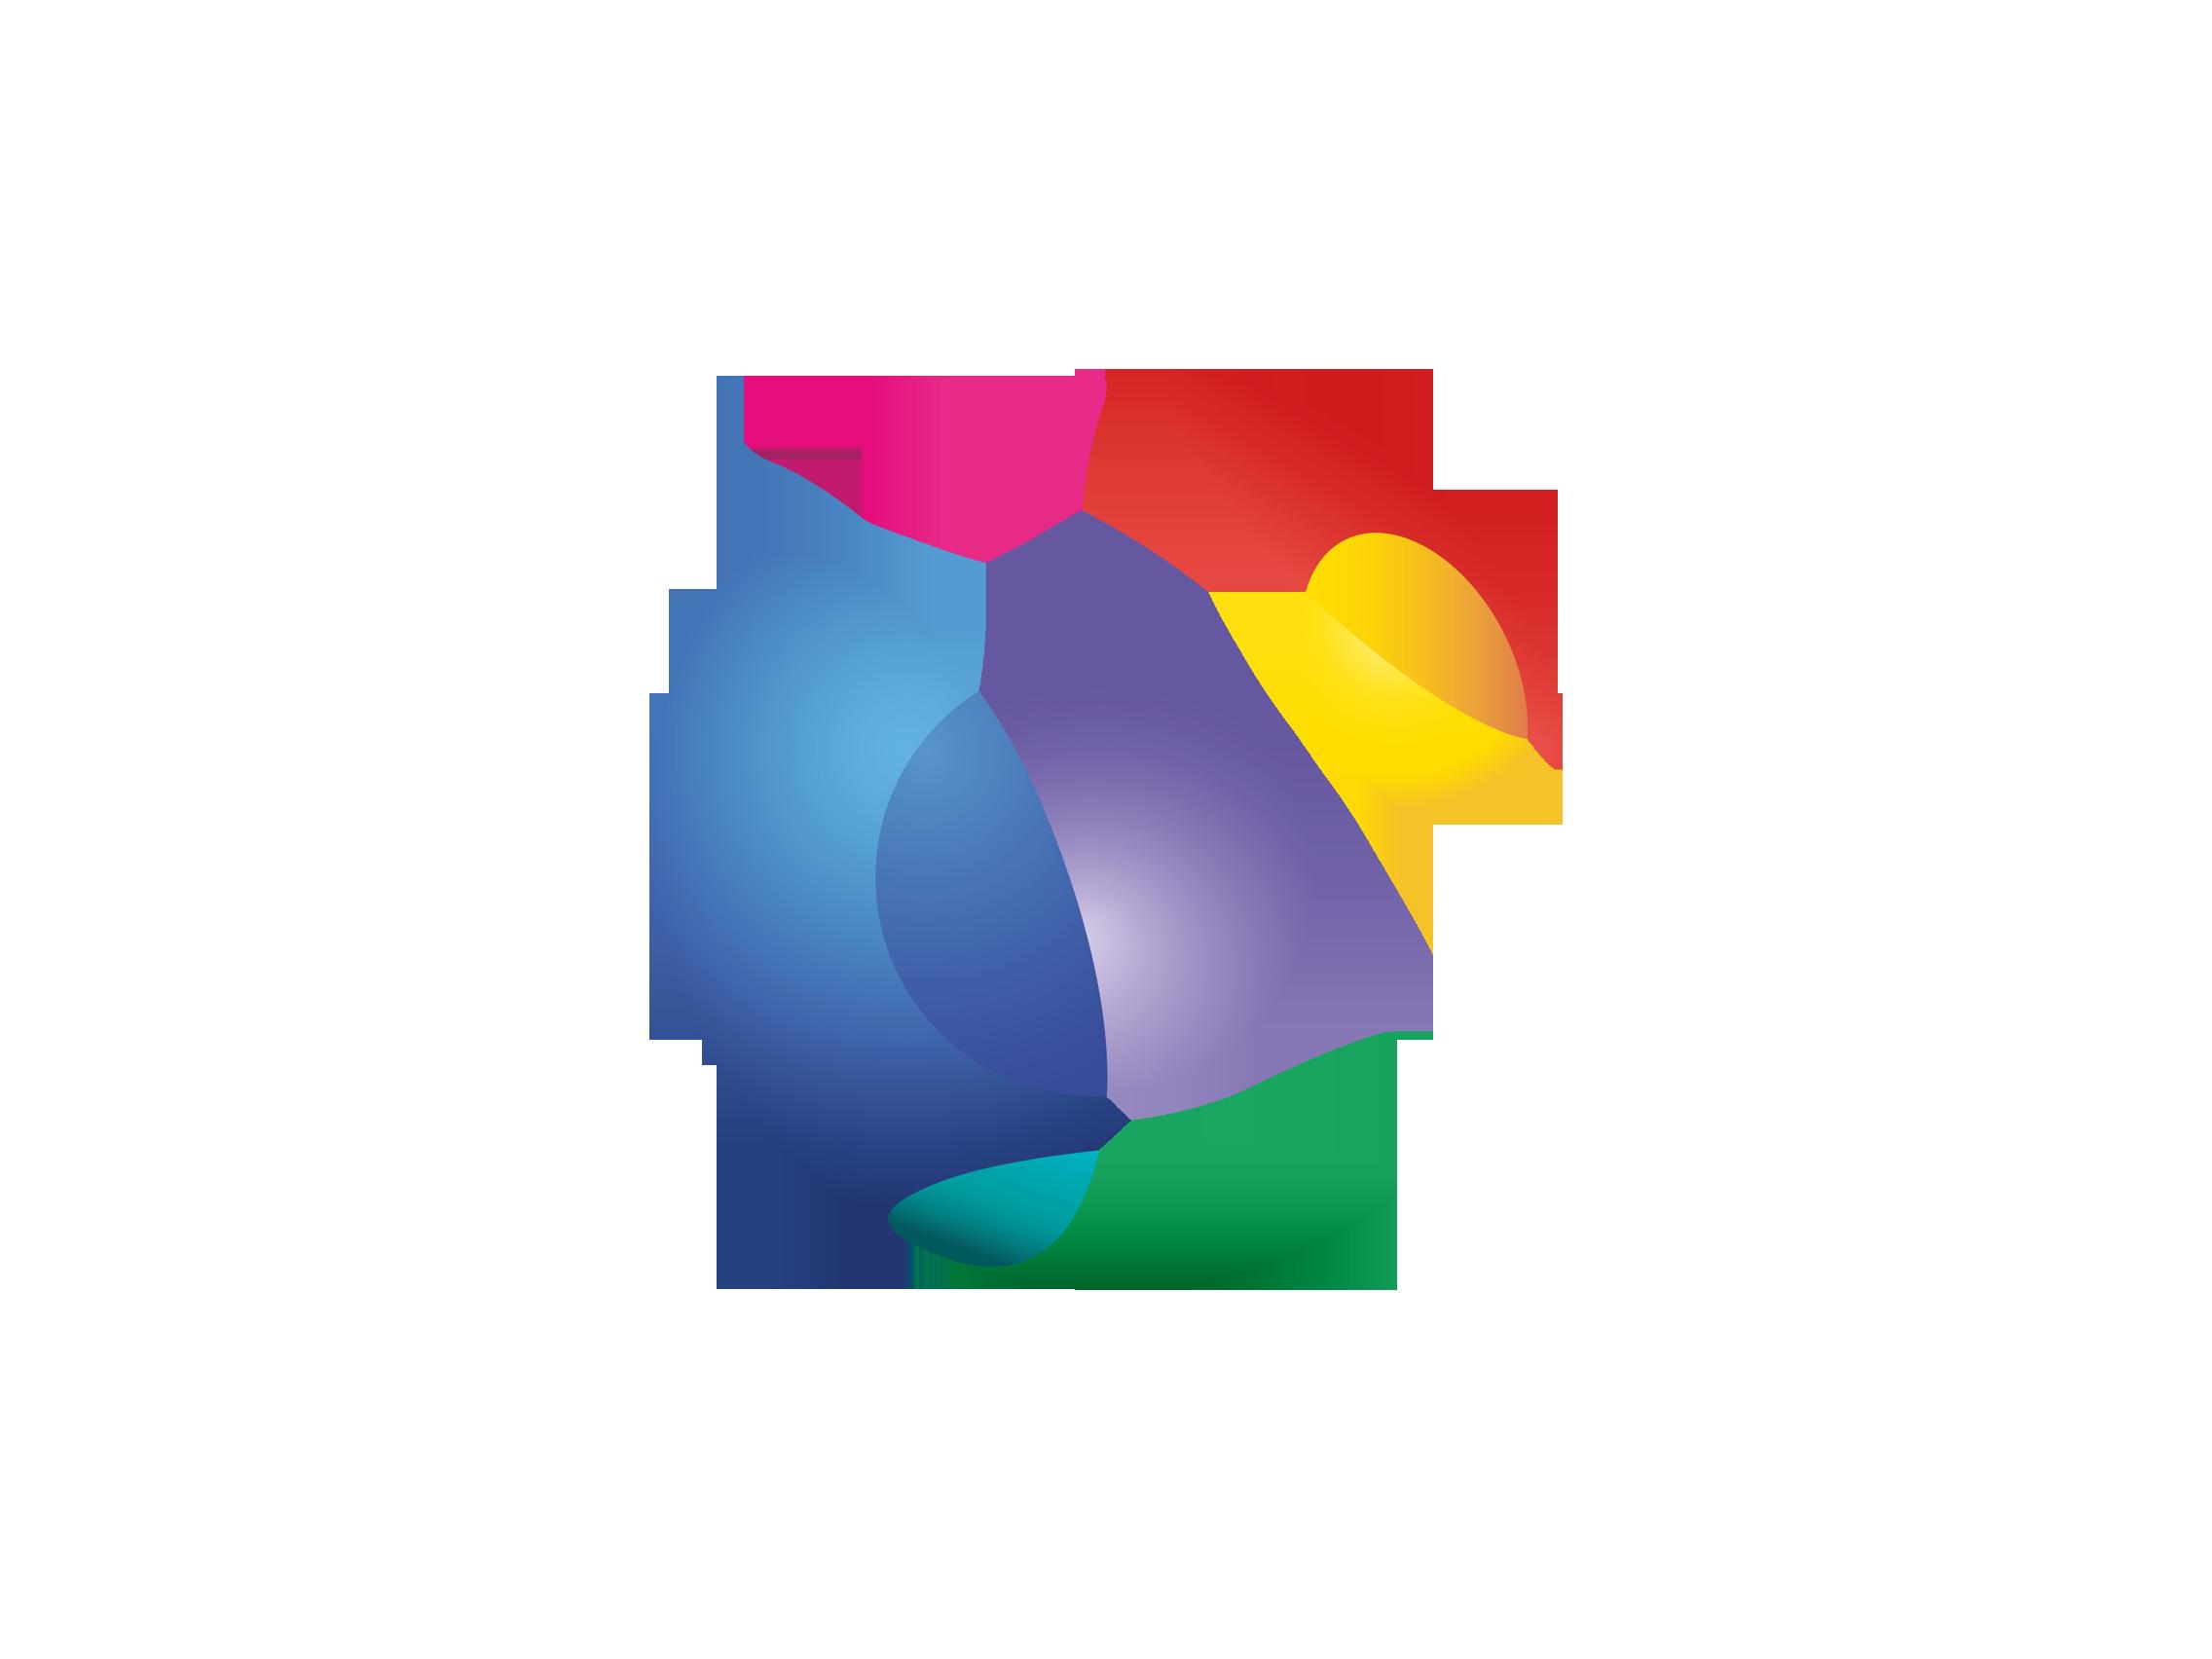 logo Google 搜索 Logos, Money logo, School logos